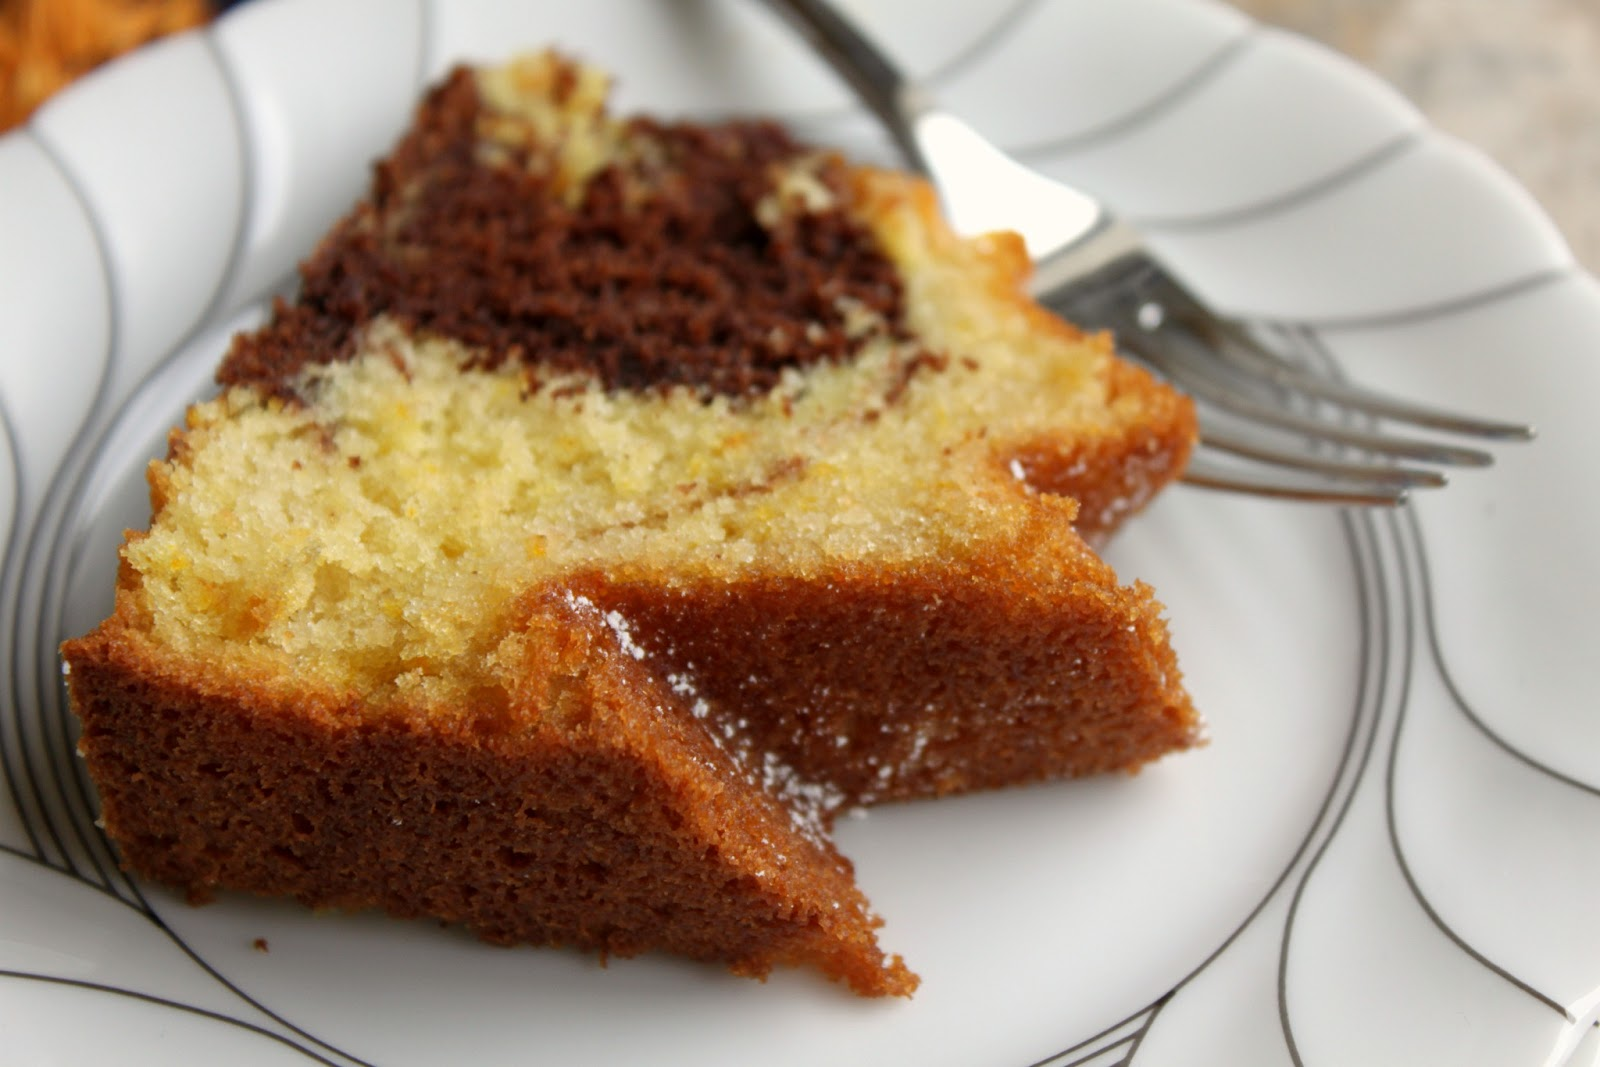 Tates Bake Shop Cakes